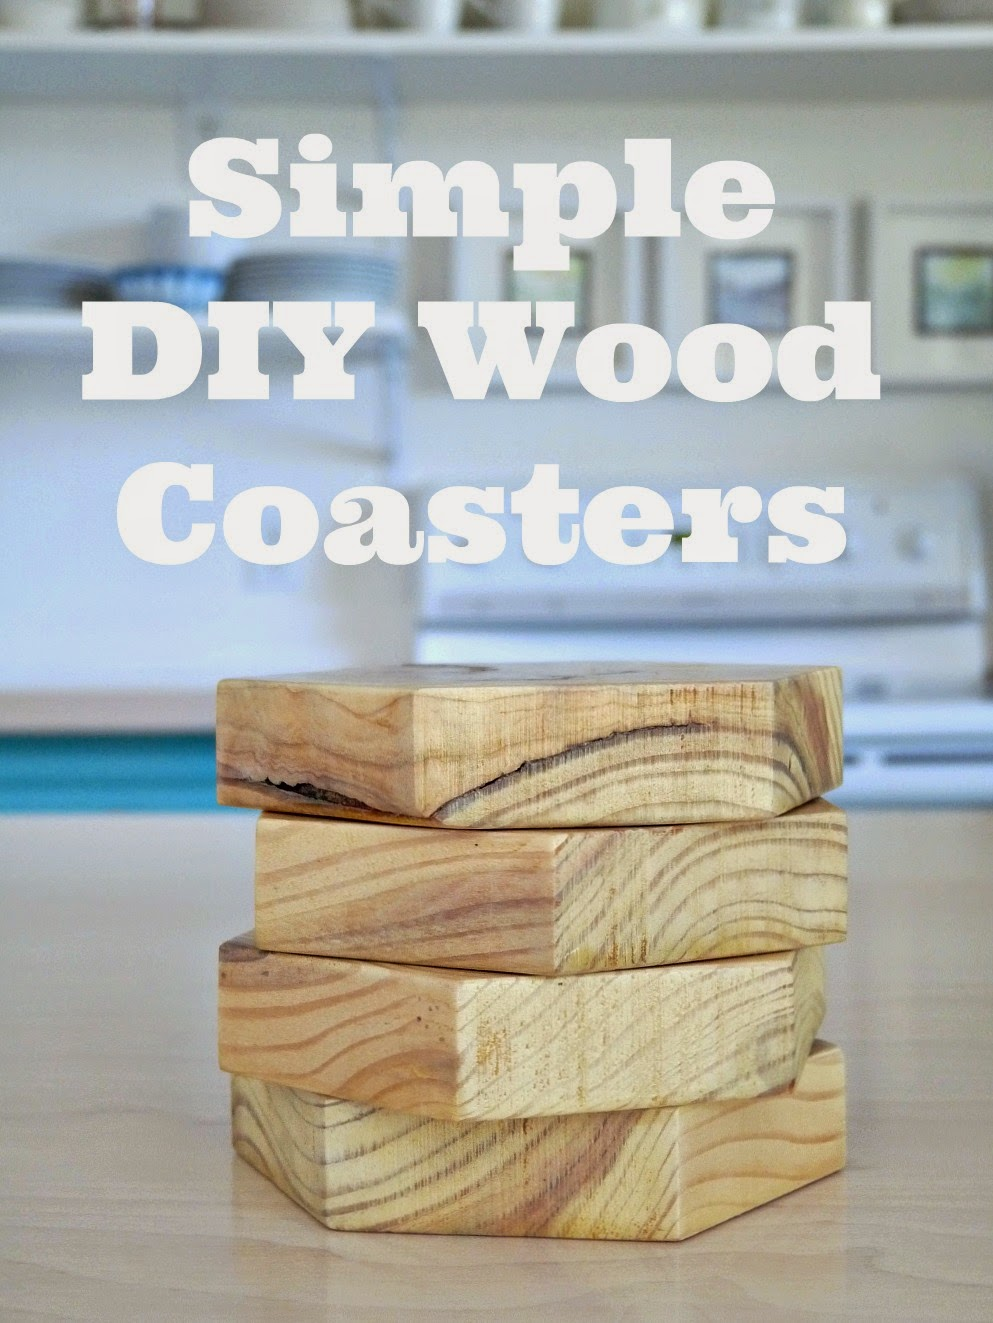 diy wood coasters two ways dans le lakehouse. Black Bedroom Furniture Sets. Home Design Ideas